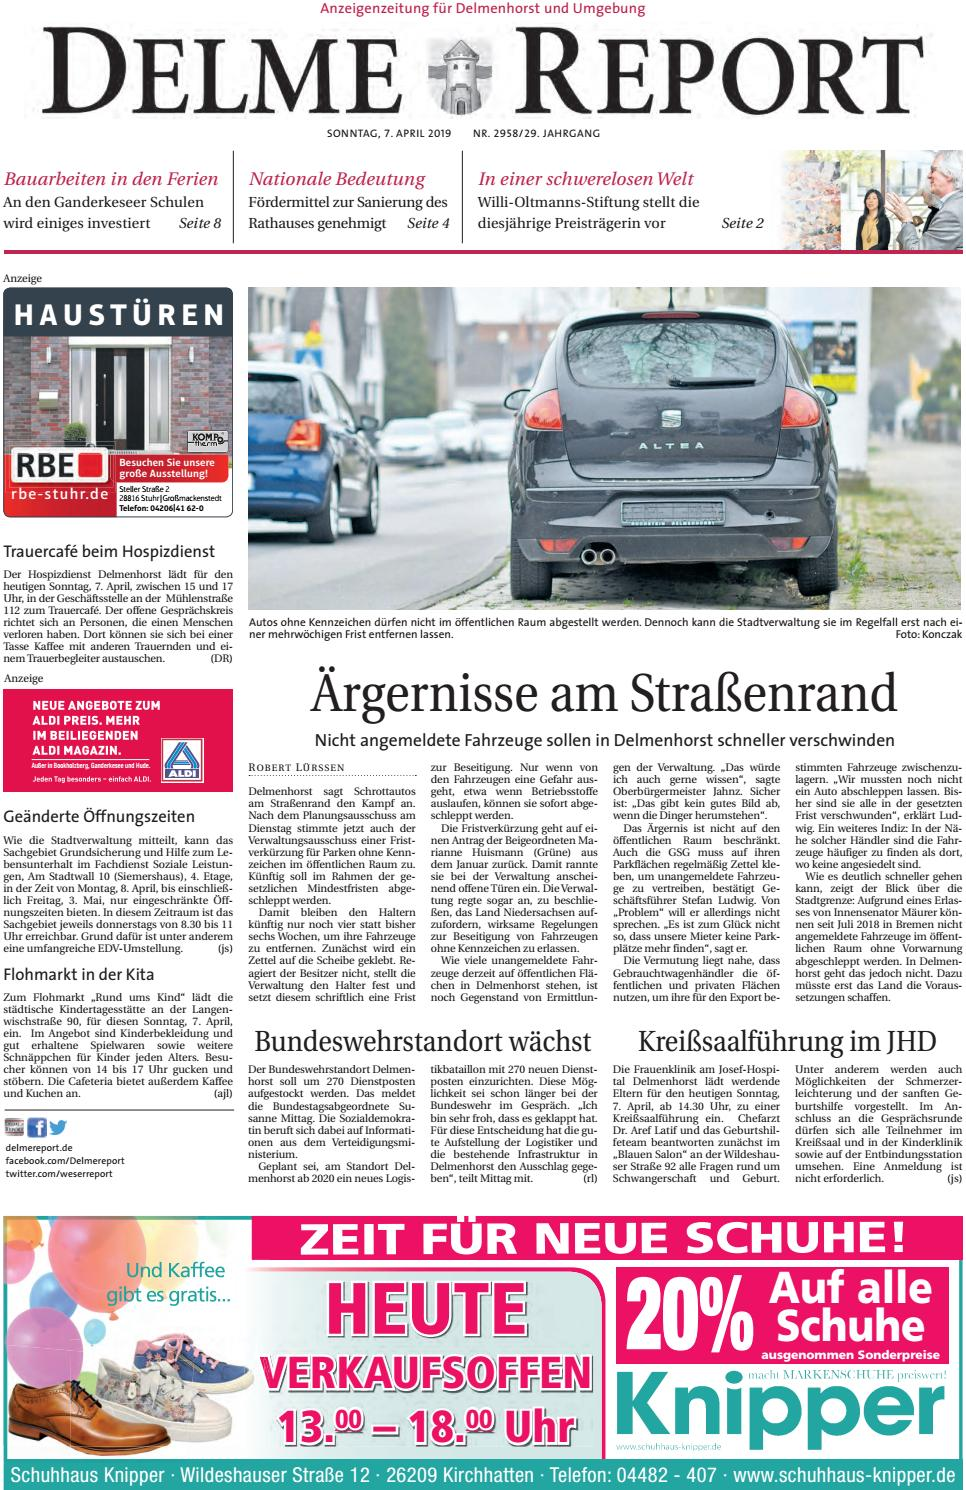 Delme Report vom 07.04.2019 by KPS Verlagsgesellschaft mbH - issuu